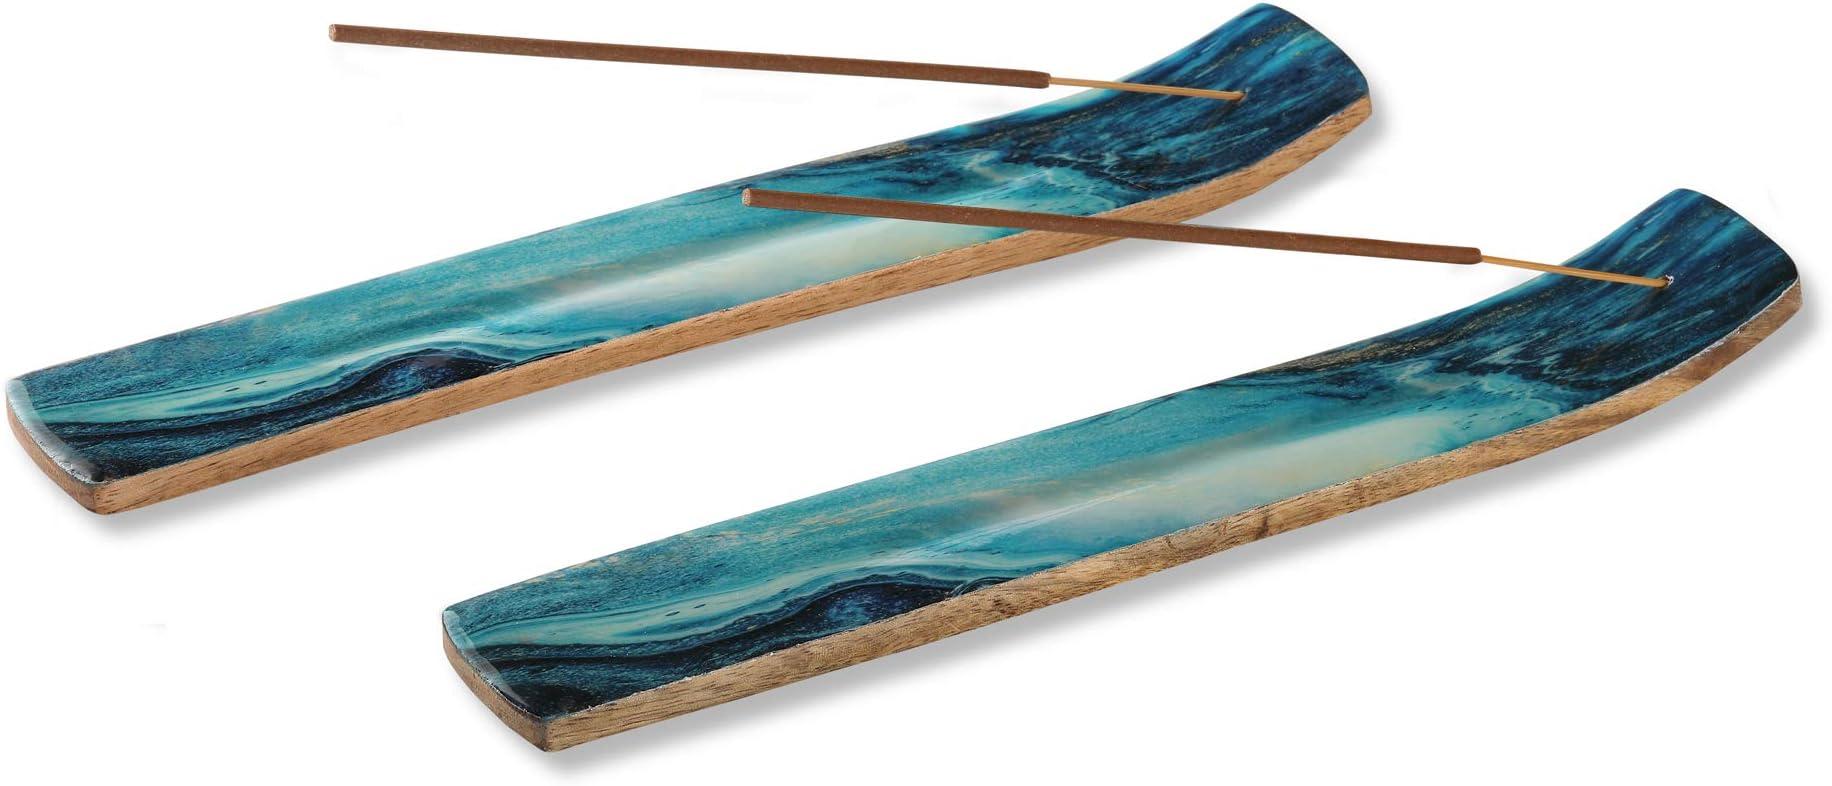 Flower incense holder Pyrography incense holder Dahlia incense holder Wooden incense holder House warming gift